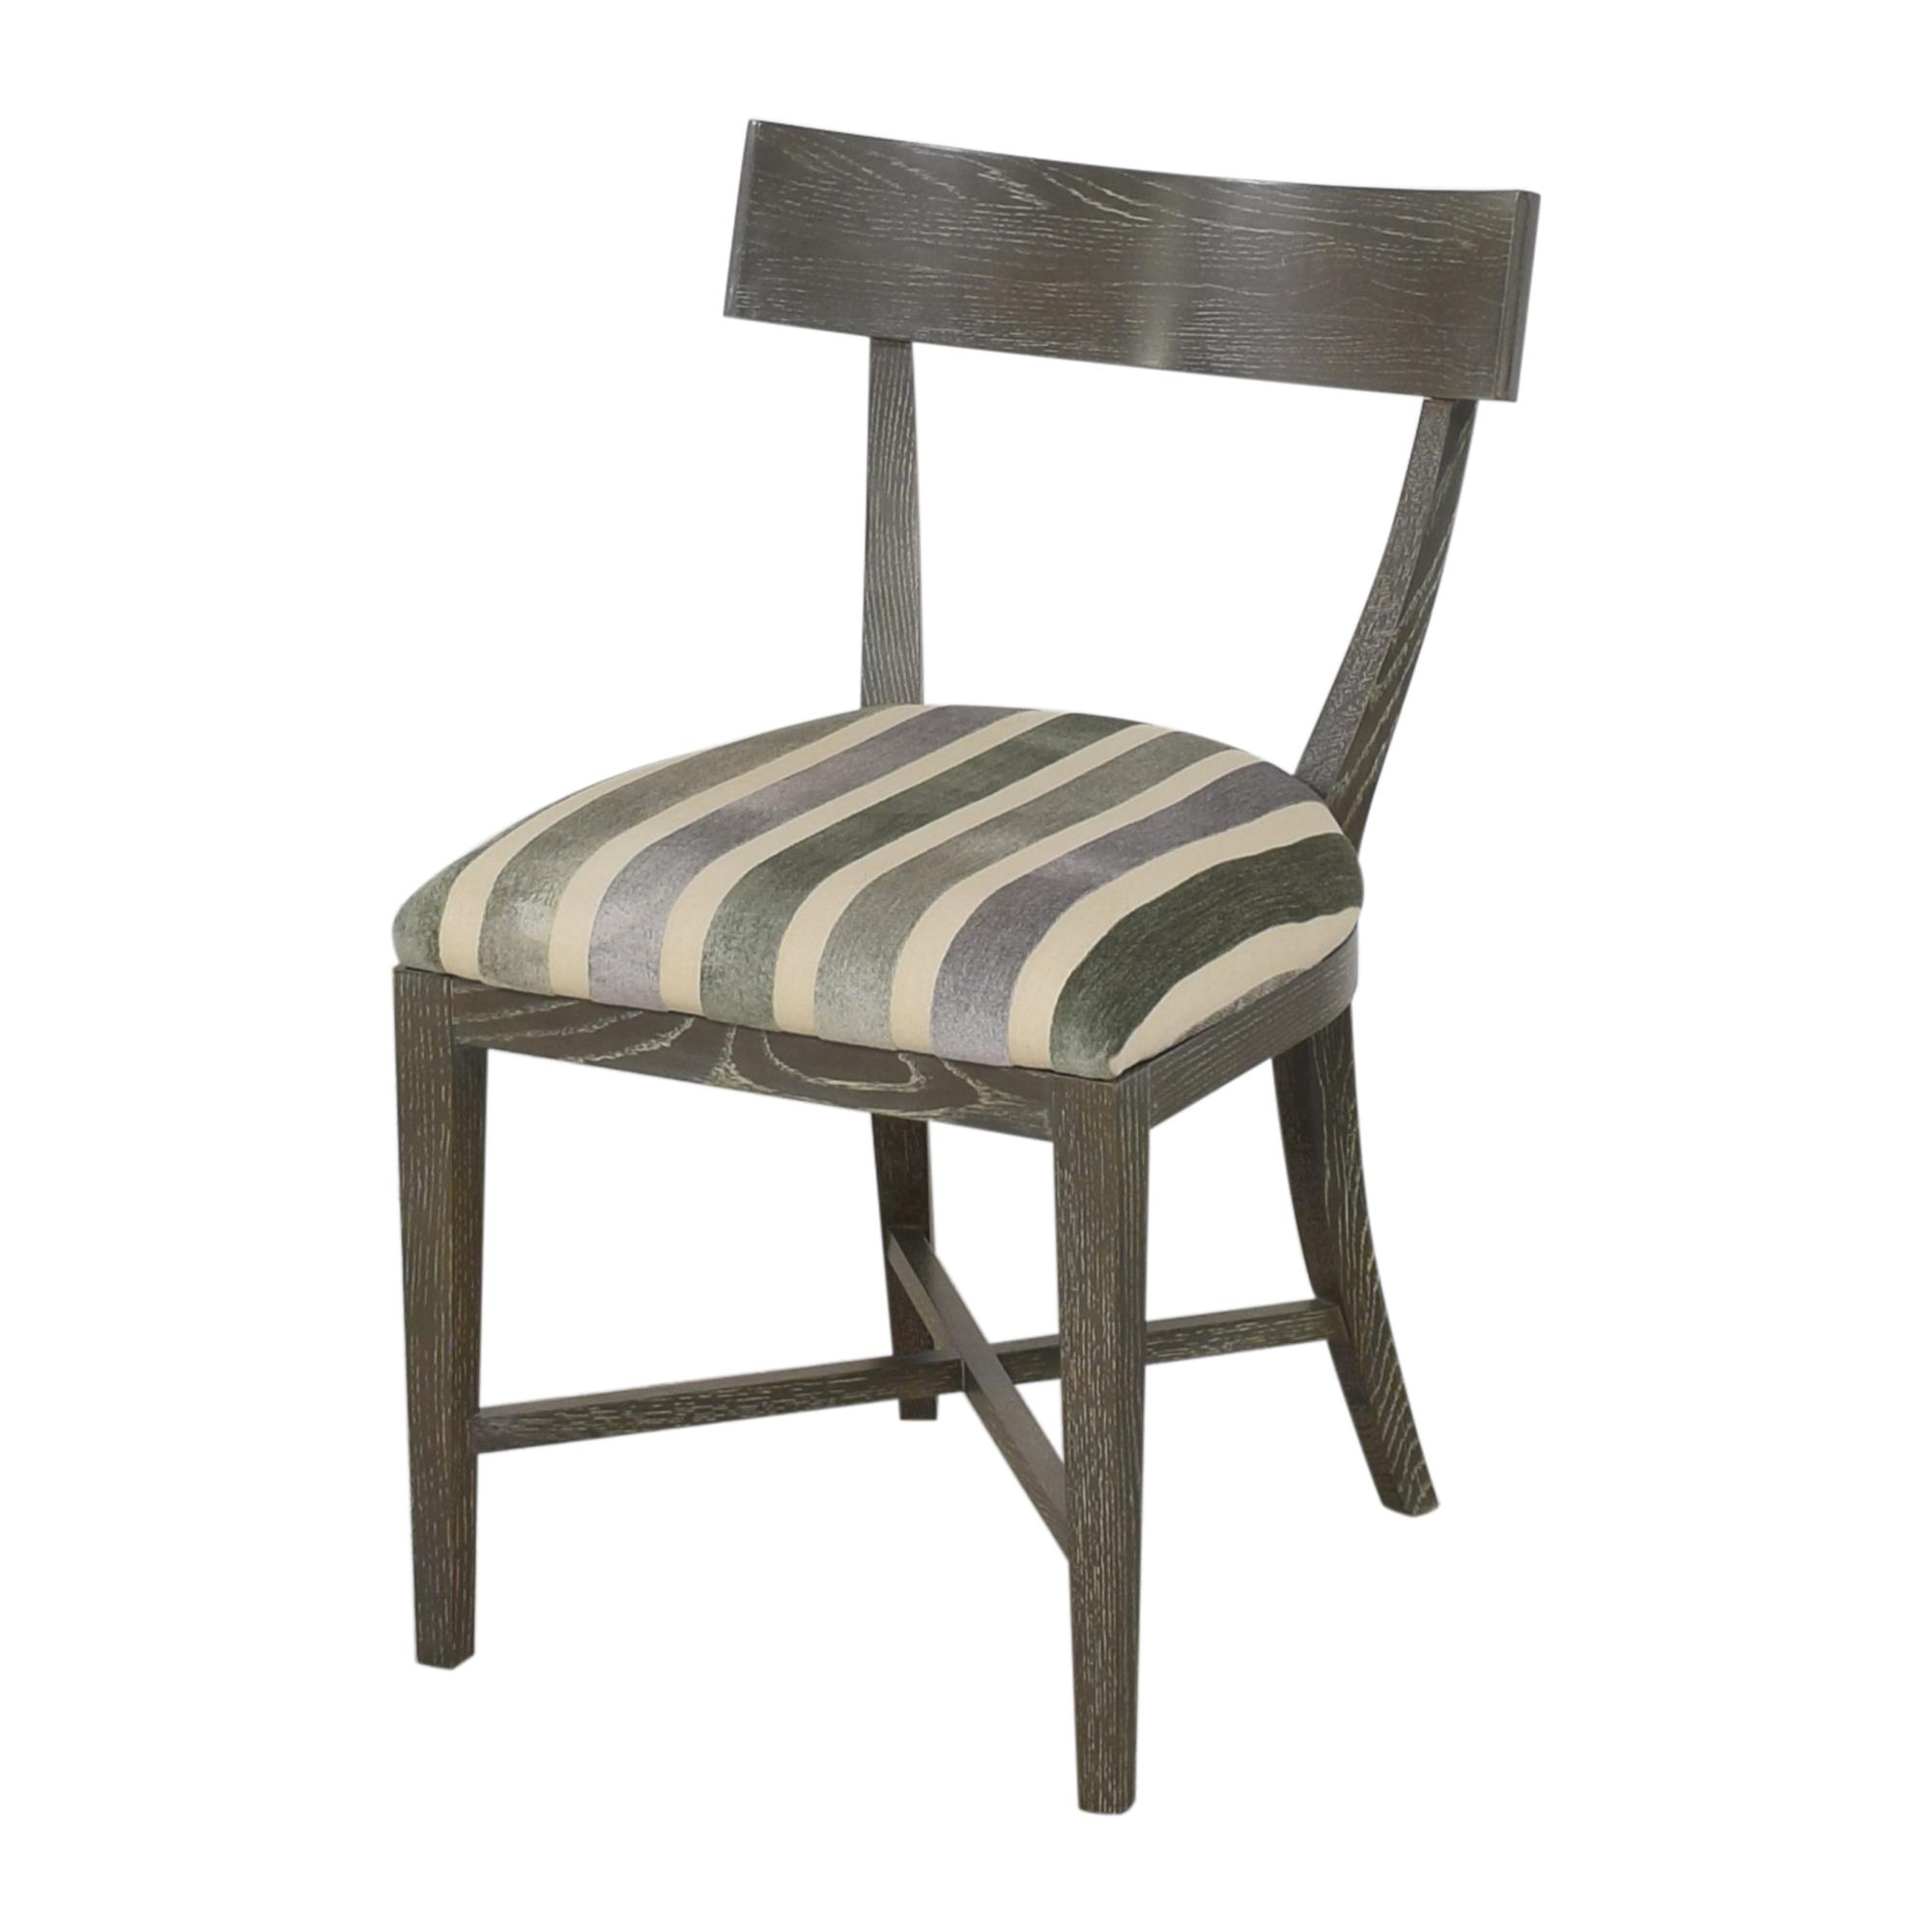 Arteriors Arteriors Caden Dining Chairs